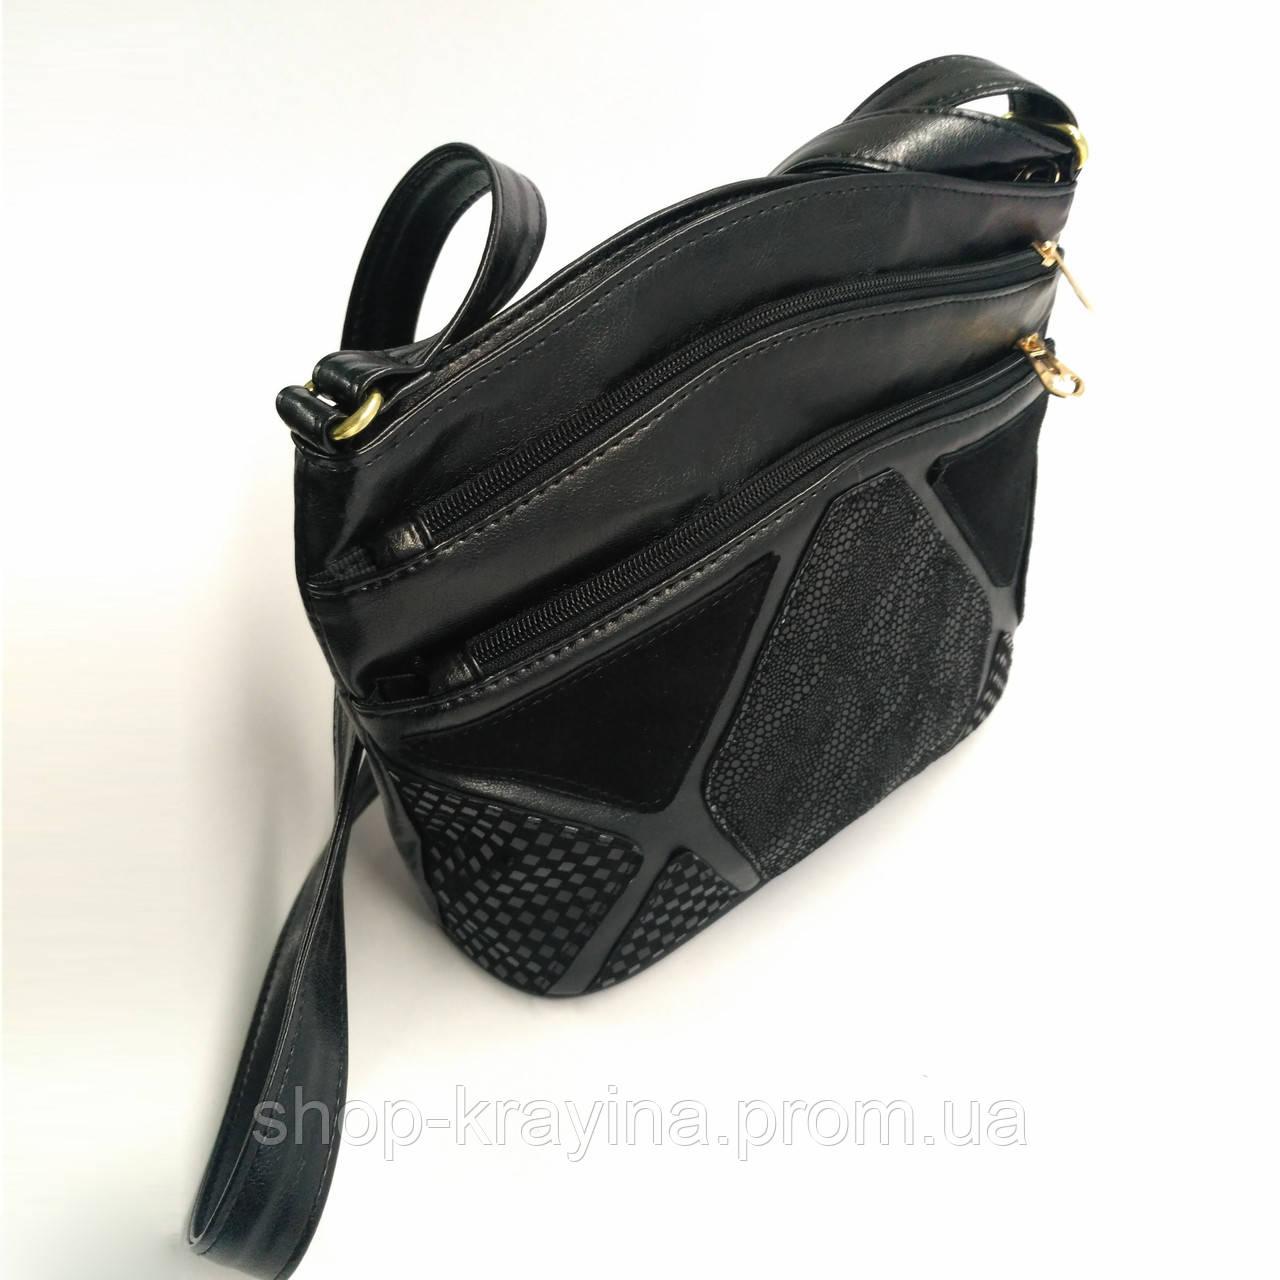 Cумка black elegance G 27*22*11 см